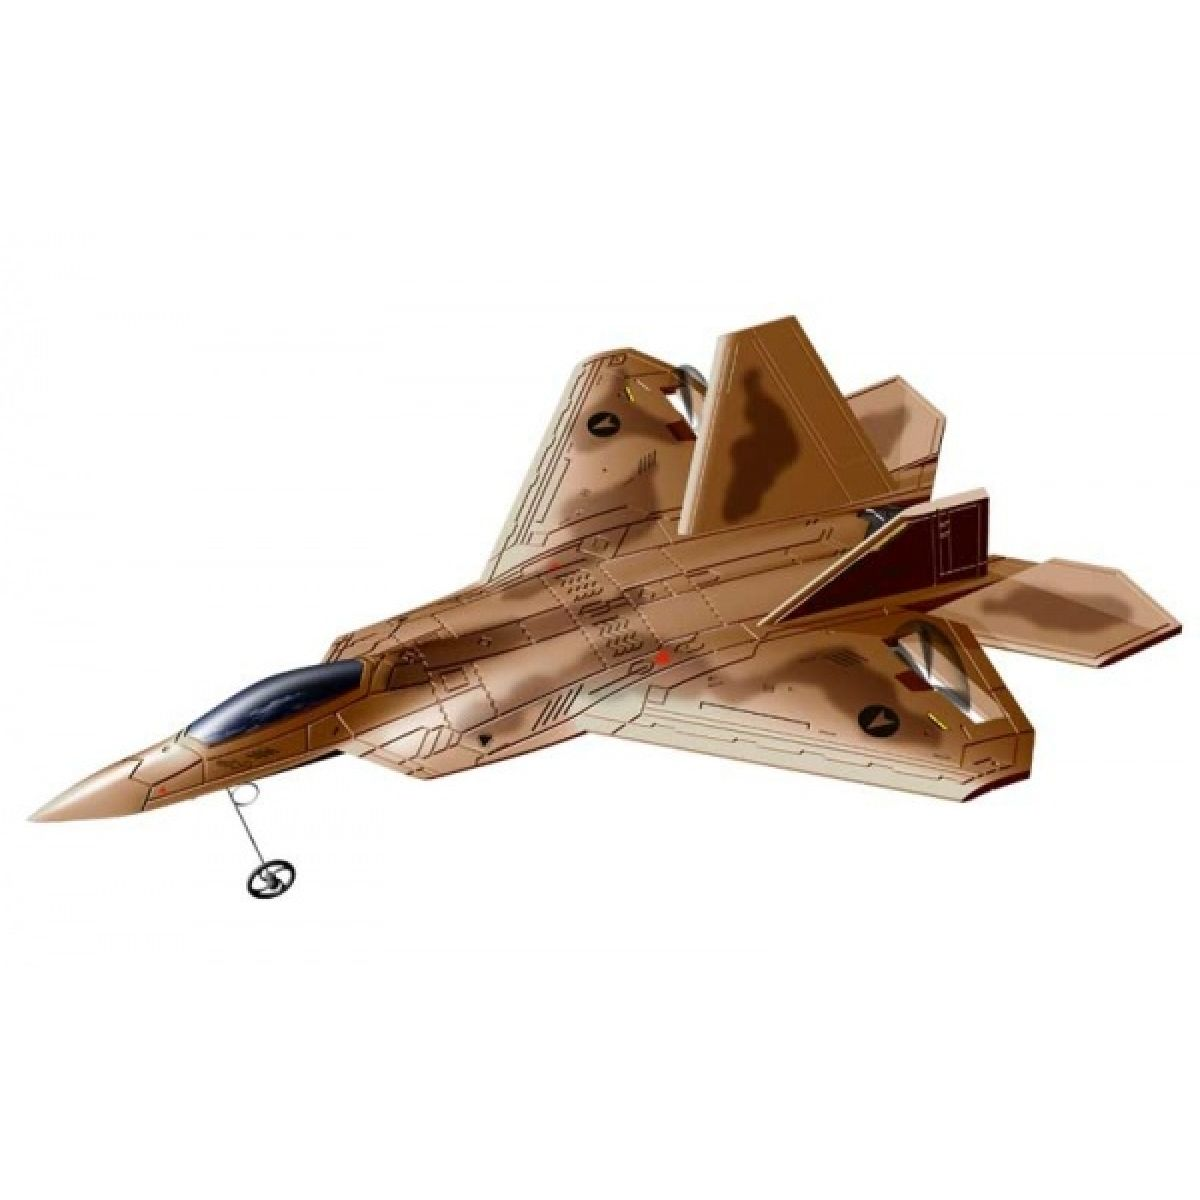 Silverit Letadlo R/C F22 - Hnědá